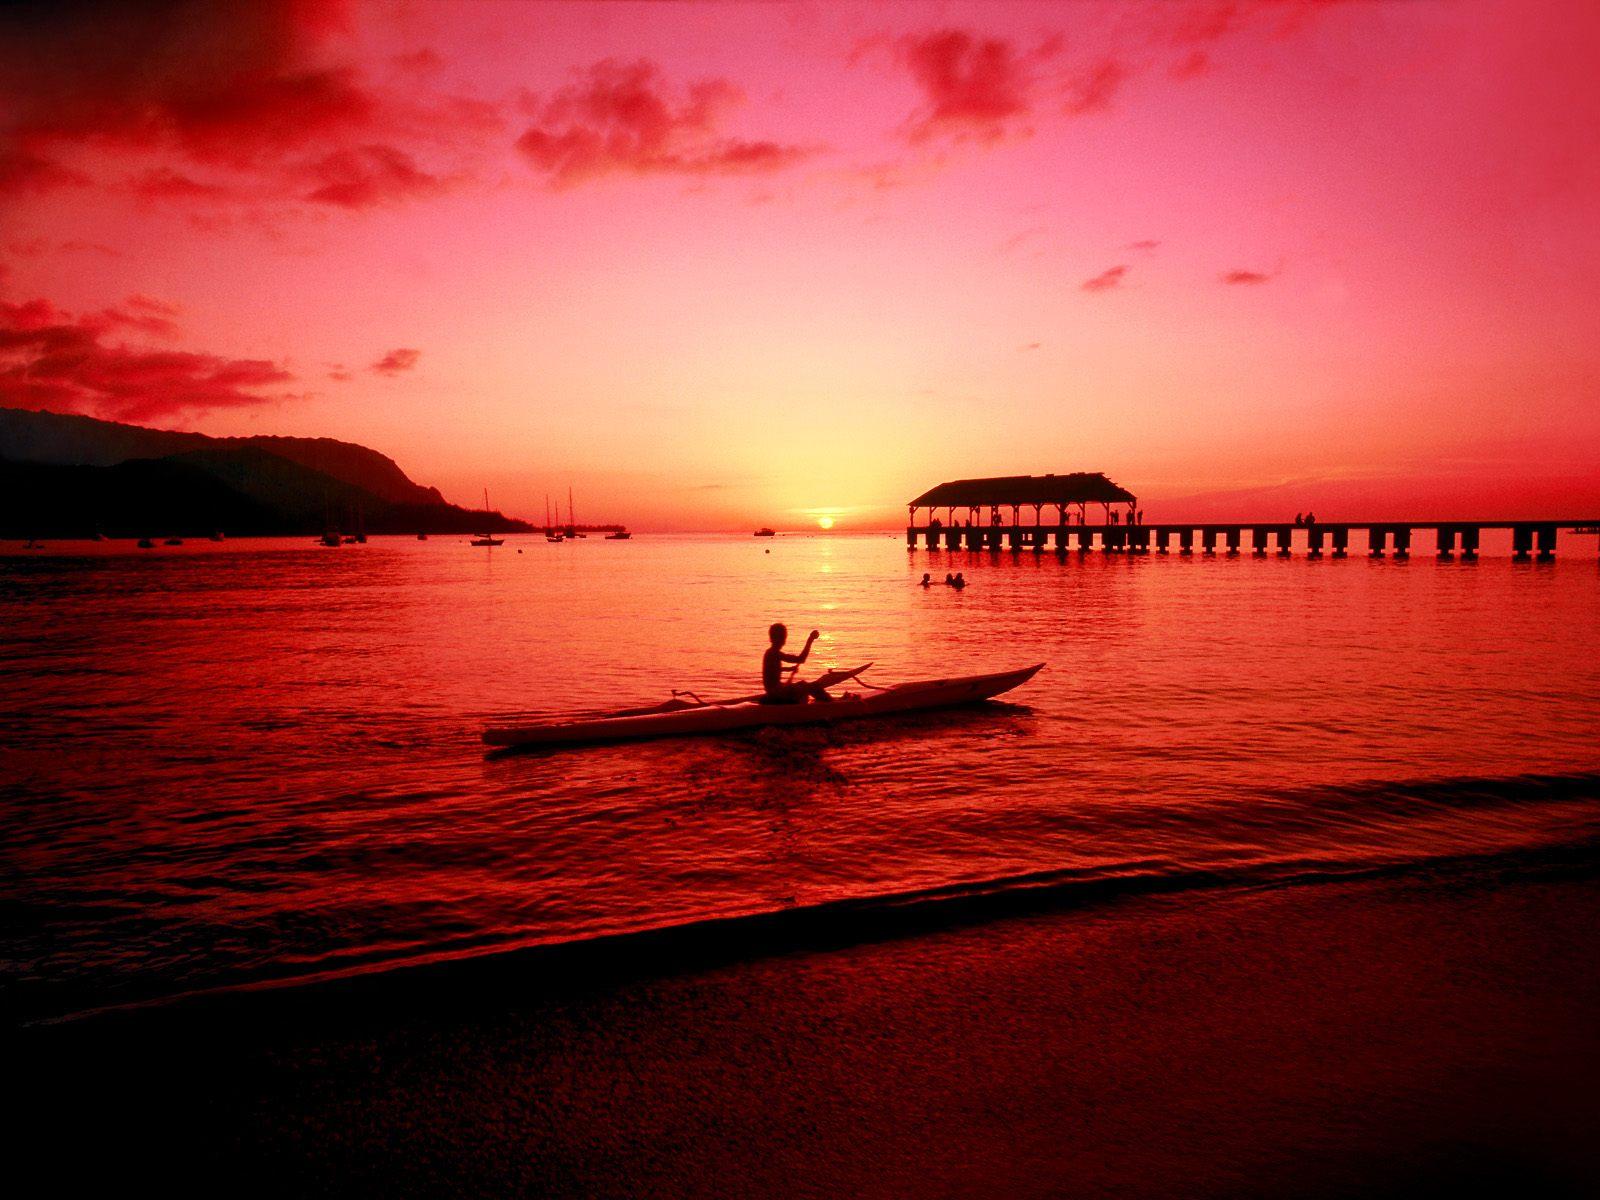 Hd Tropical Island Beach Paradise Wallpapers And Backgrounds: Wallpaper: Tropical Island Sunset Wallpaper